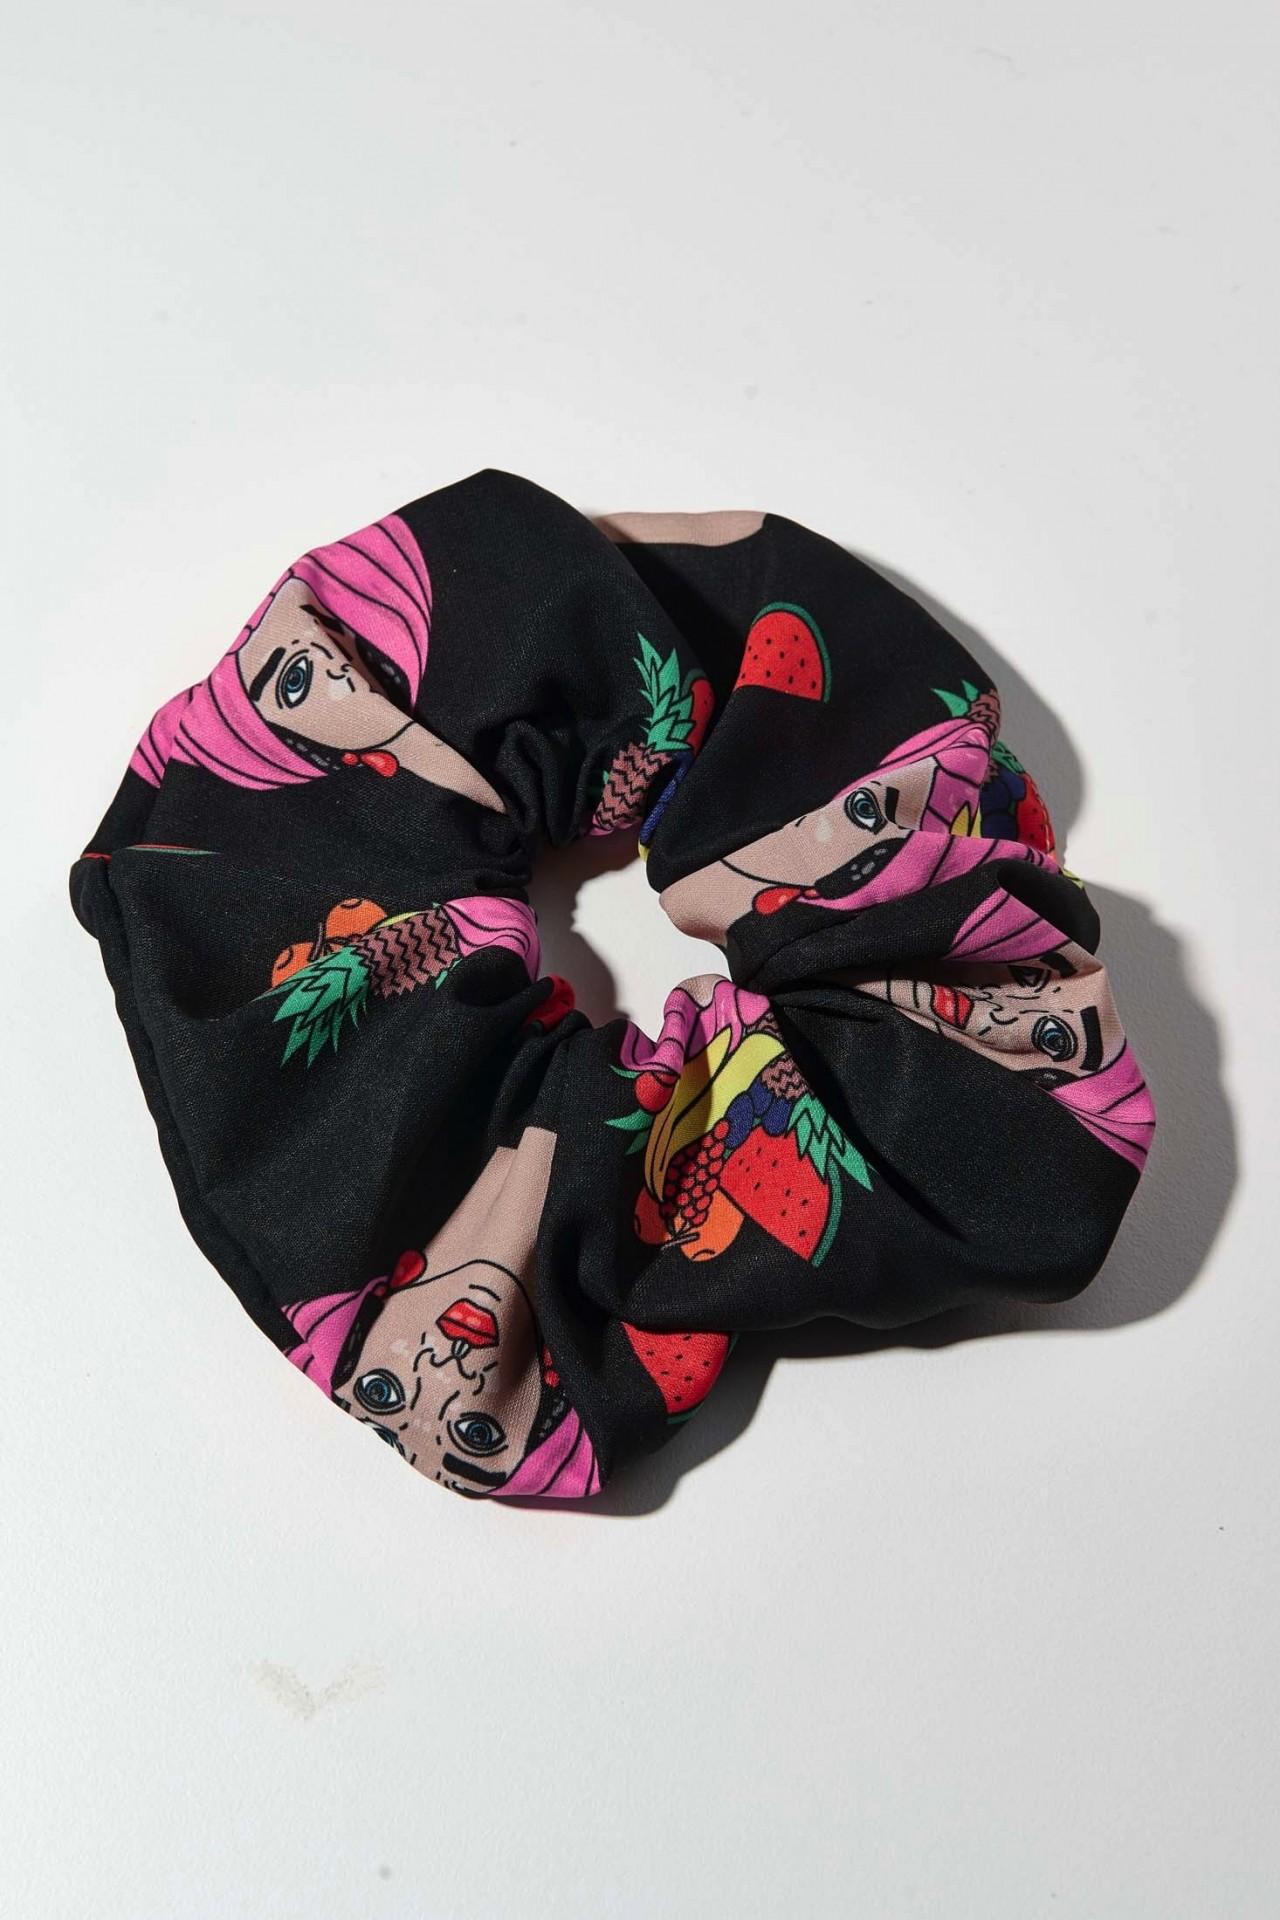 TRIBE SCRUNCHIE (BLACK & PINK SICILIAN HEADS) - KARAVAN CLOTHING